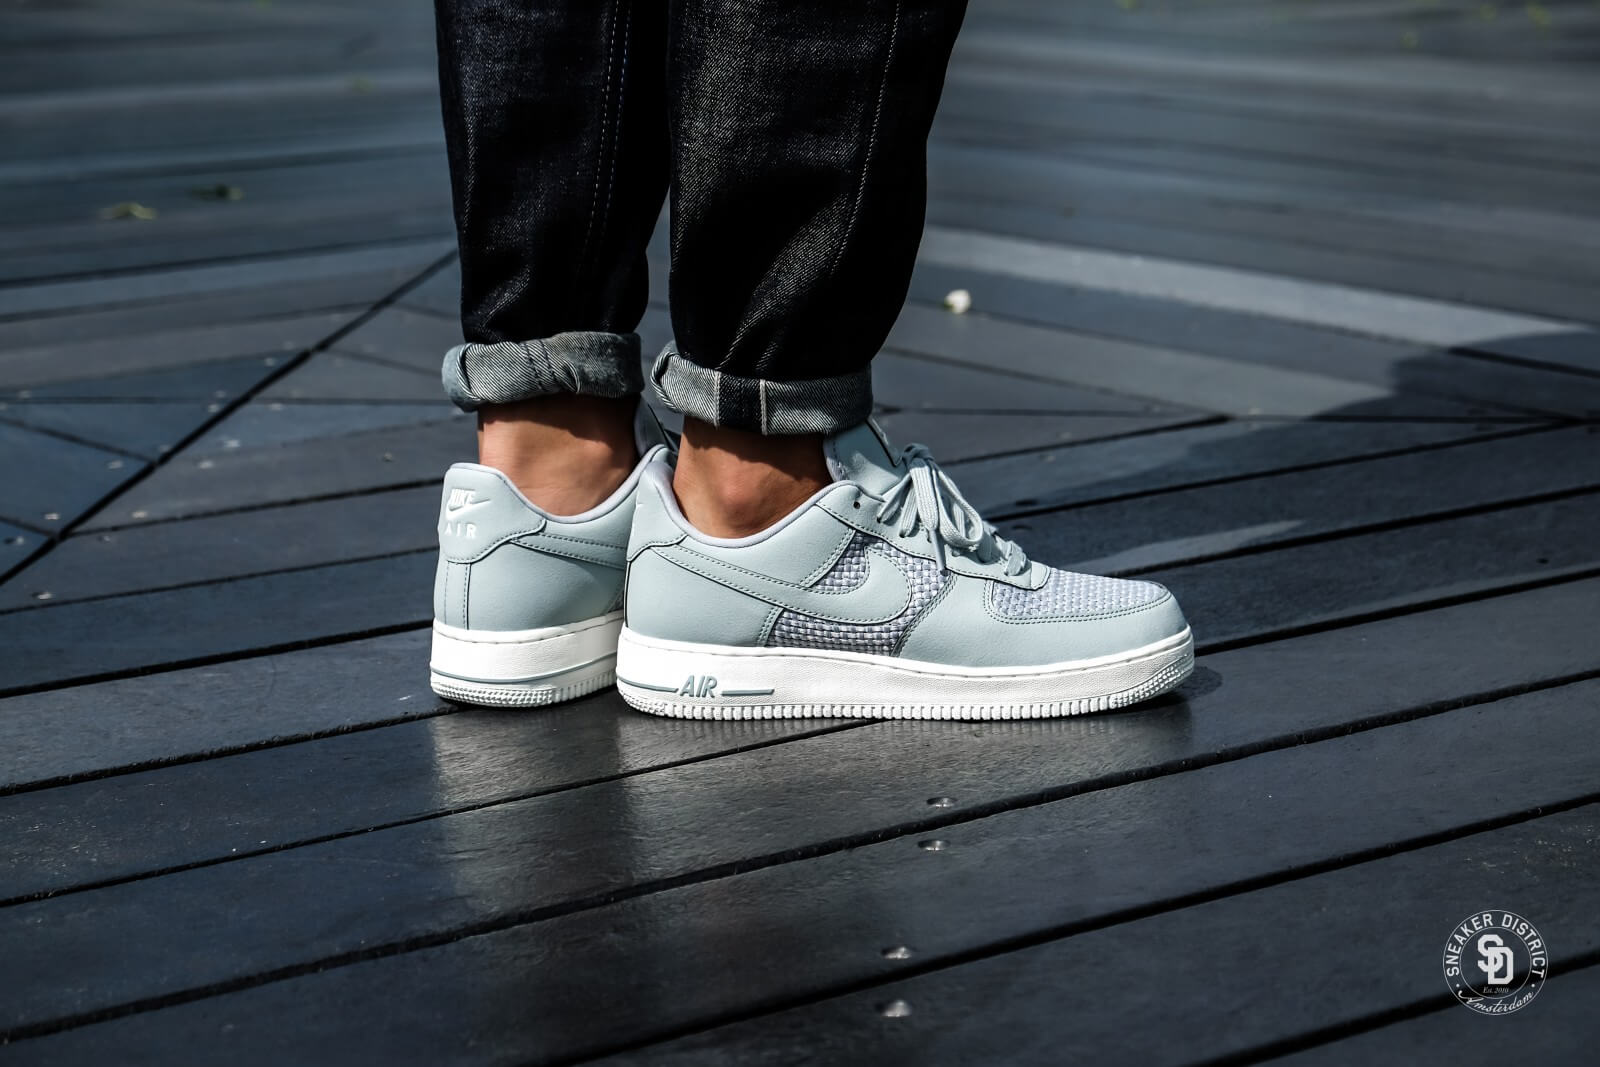 nike air force 1 pumice white